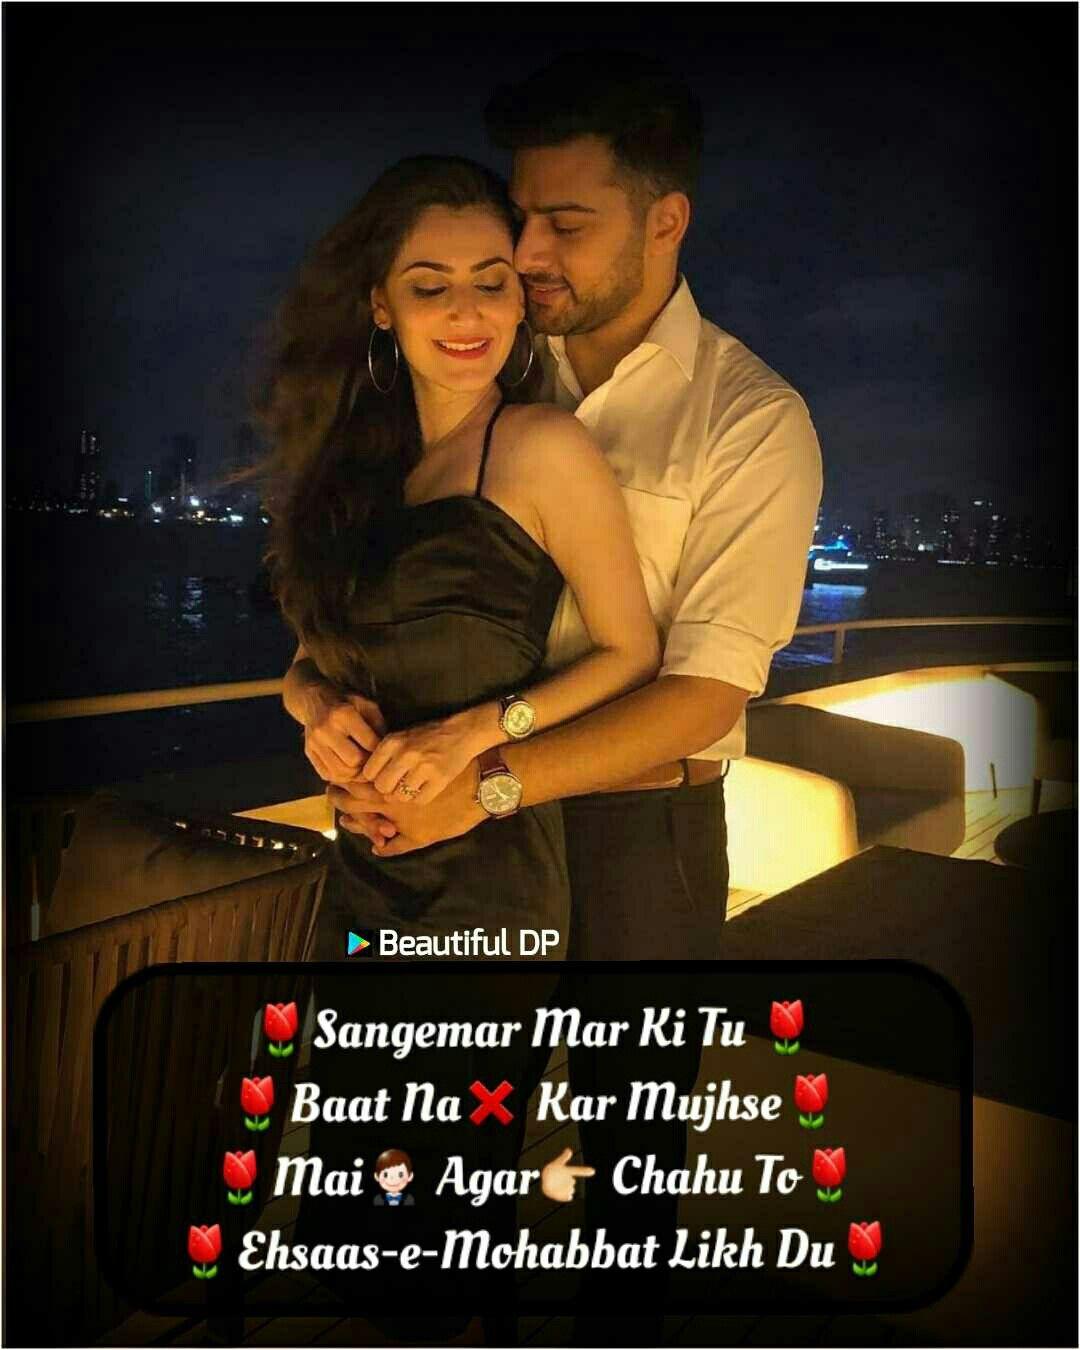 Hamari Adhuri Kahani Trailer Review Movies, Romantic